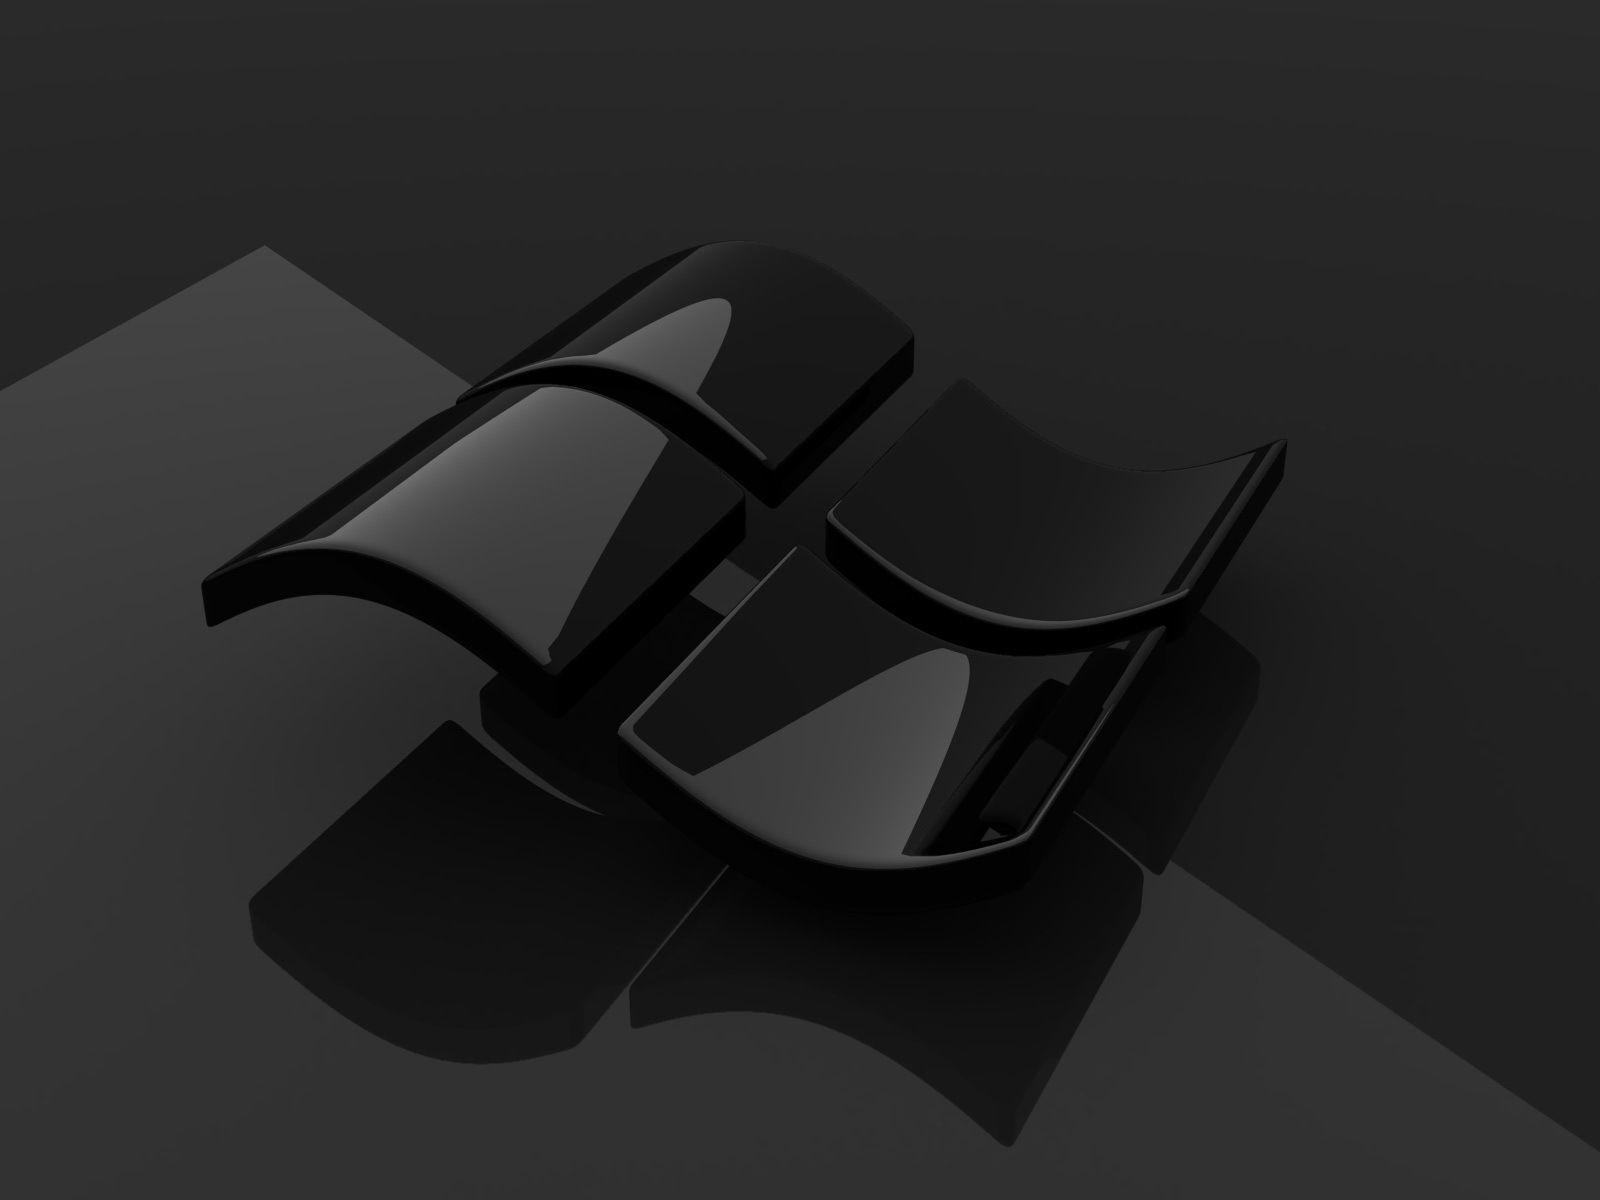 The Colour Black Wallpaper Windows Papel De Parede Do Windows Imagem De Fundo De Computador Hp Wallpaper Hd